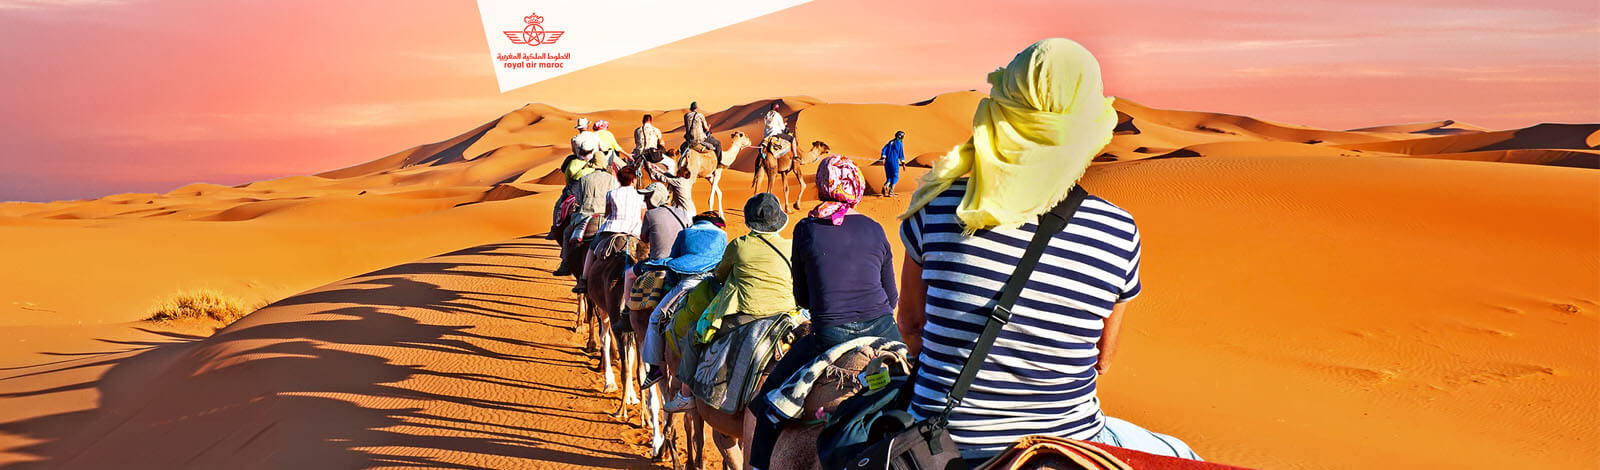 Royal Air Maroc - woestijn